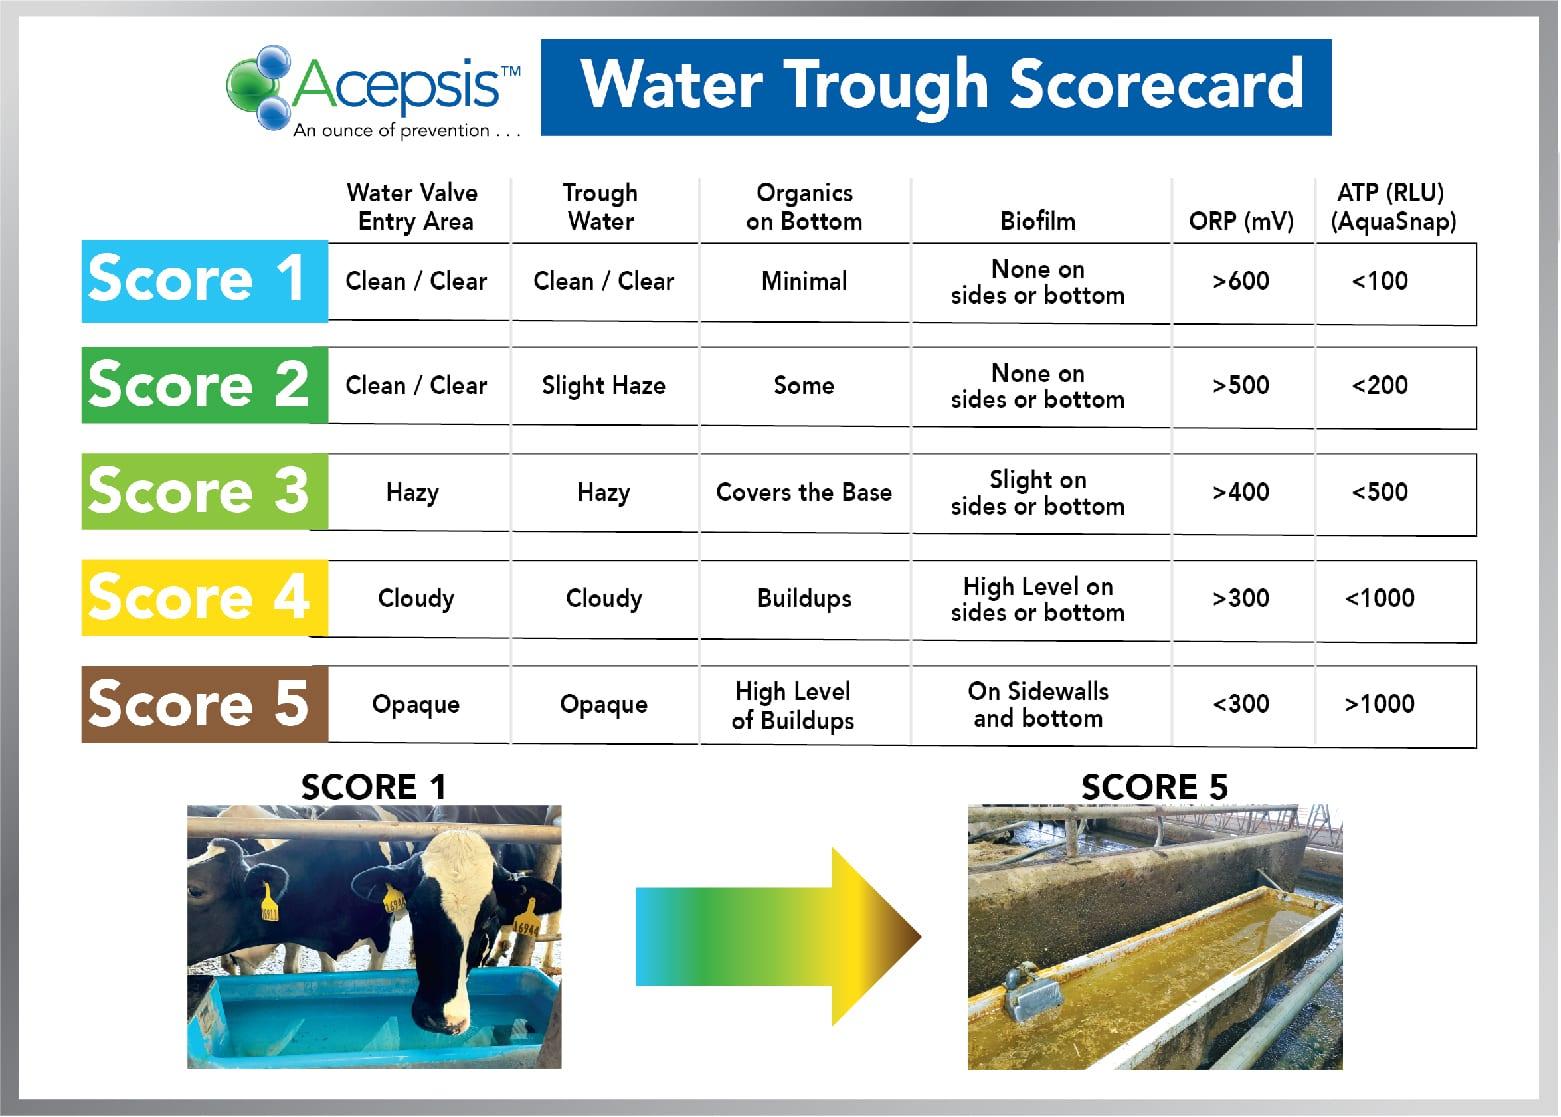 Acepsis Water Trough Scorecard